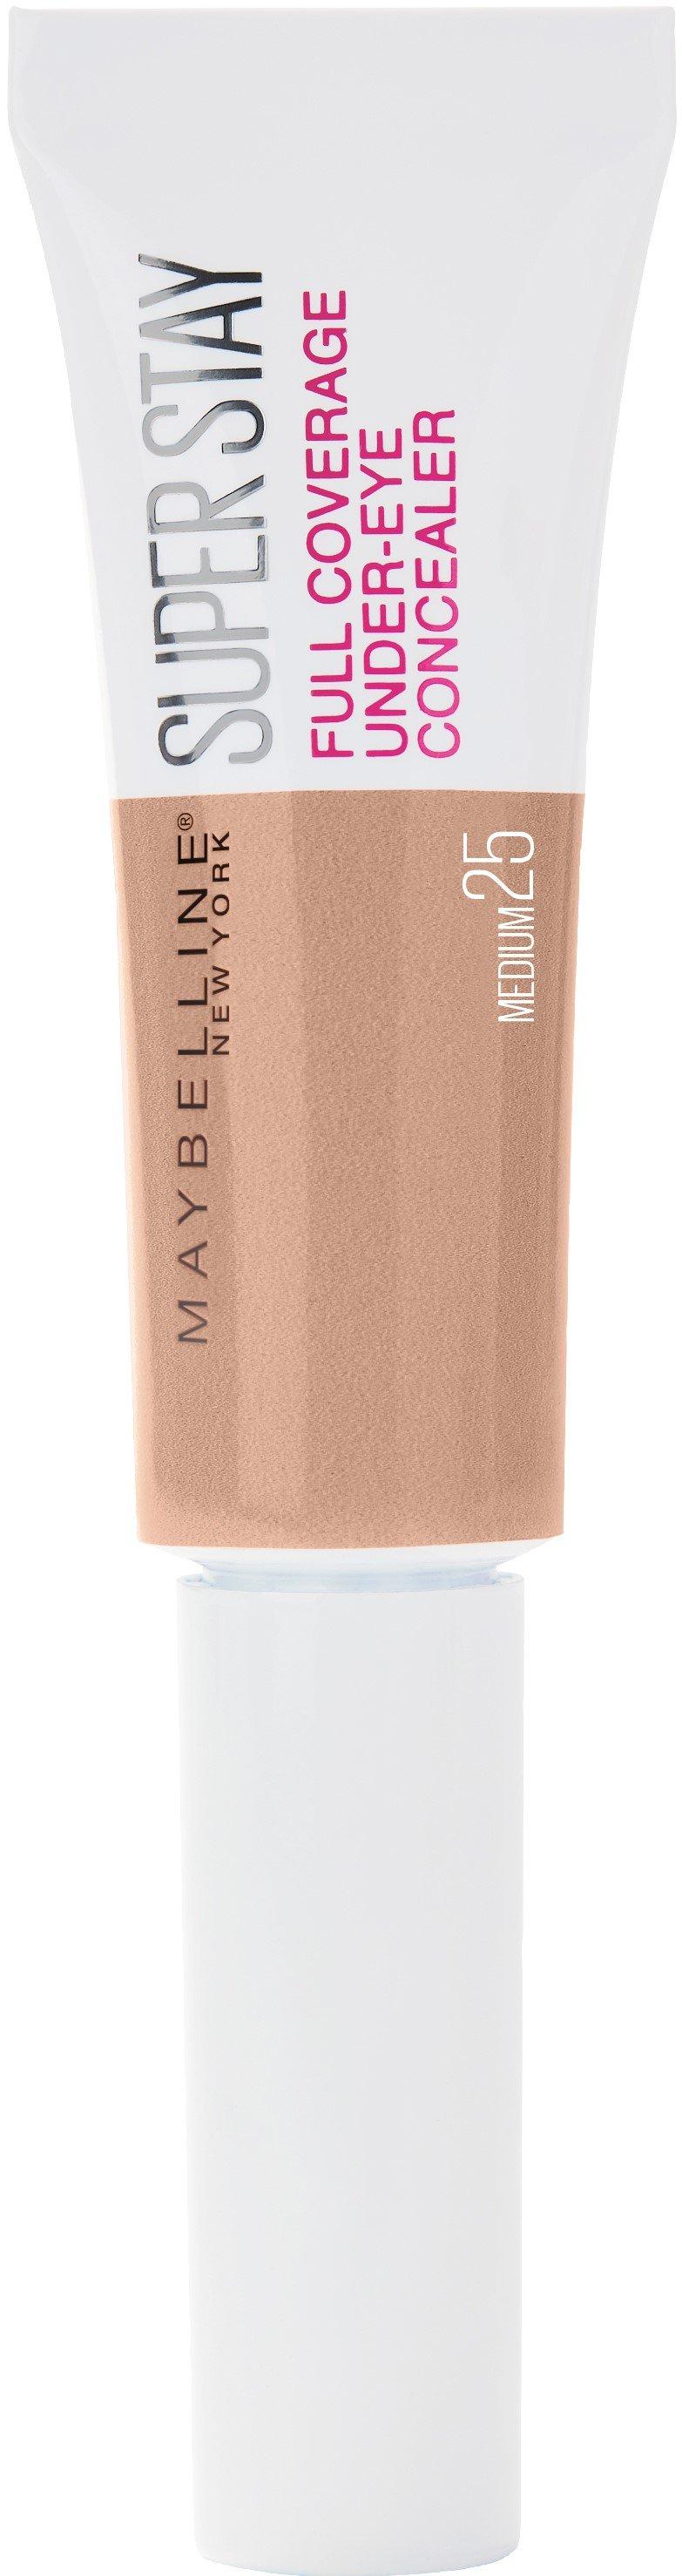 Maybelline - Superstay Full Coverage Under-Eye Concealer - 25 Medium